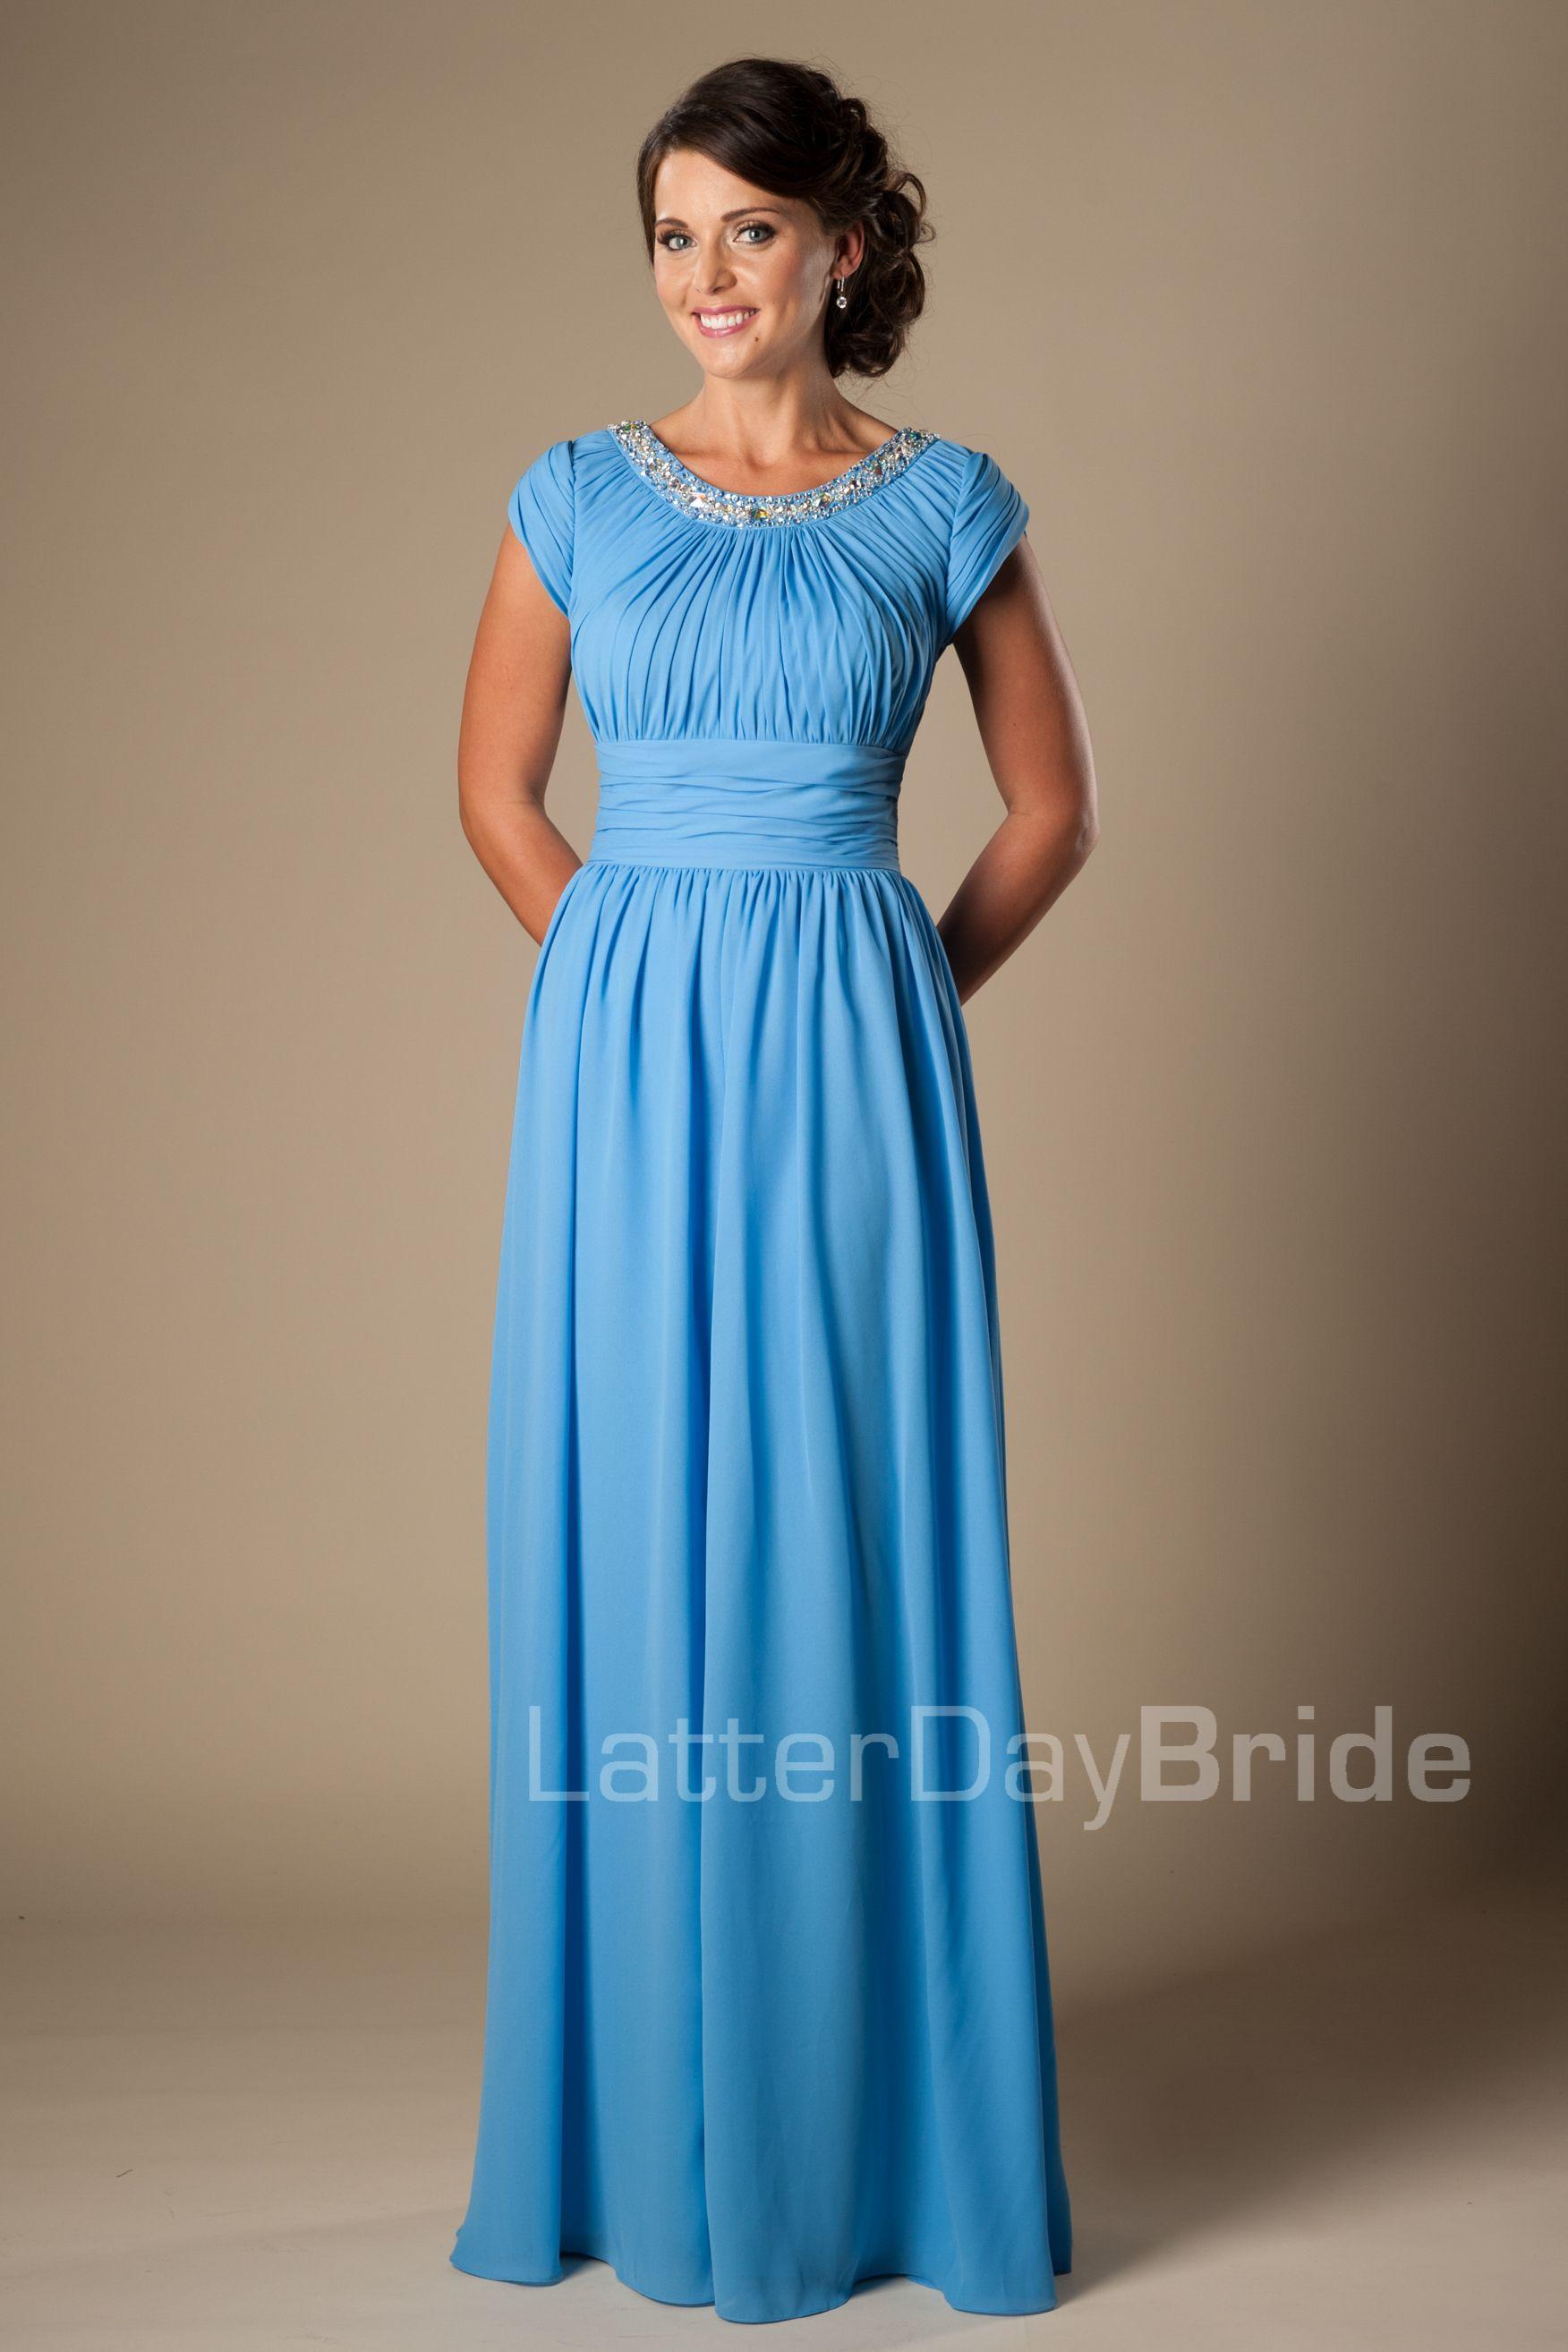 Chandler Prom Dresses Modest Modest Dresses Modest Formal Dresses [ 2628 x 1752 Pixel ]